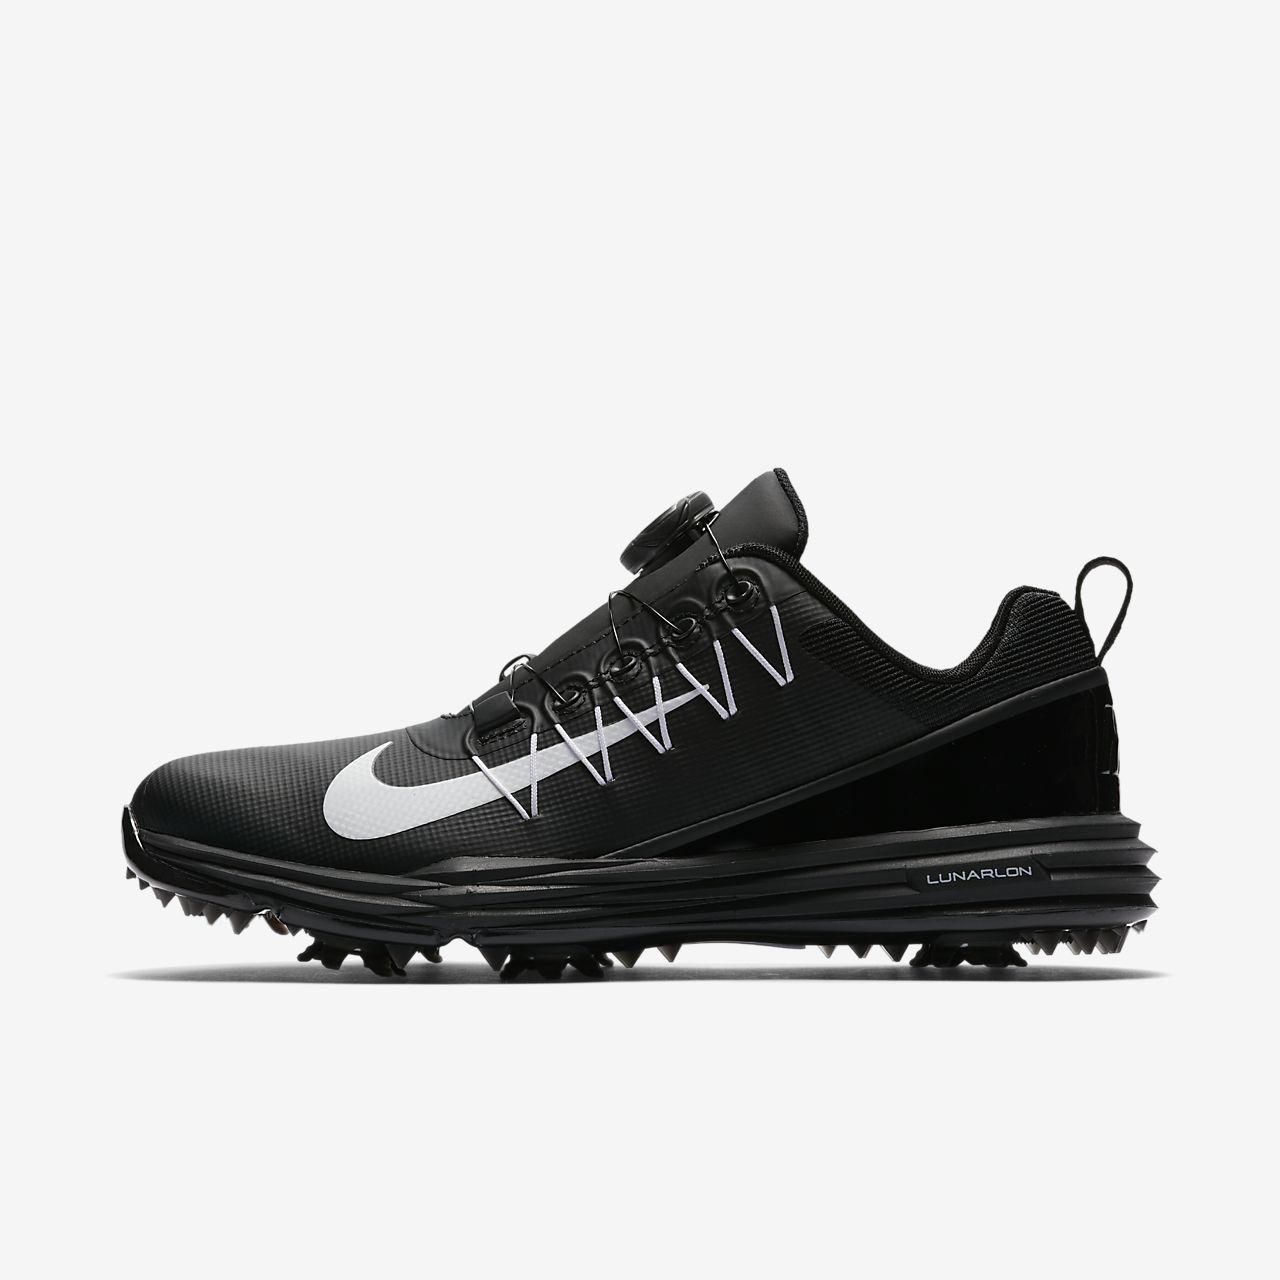 Nike Damen Wmns Lunar Command 2 Boa Golfschuhe, Schwarz (Negro 001), 38 EU